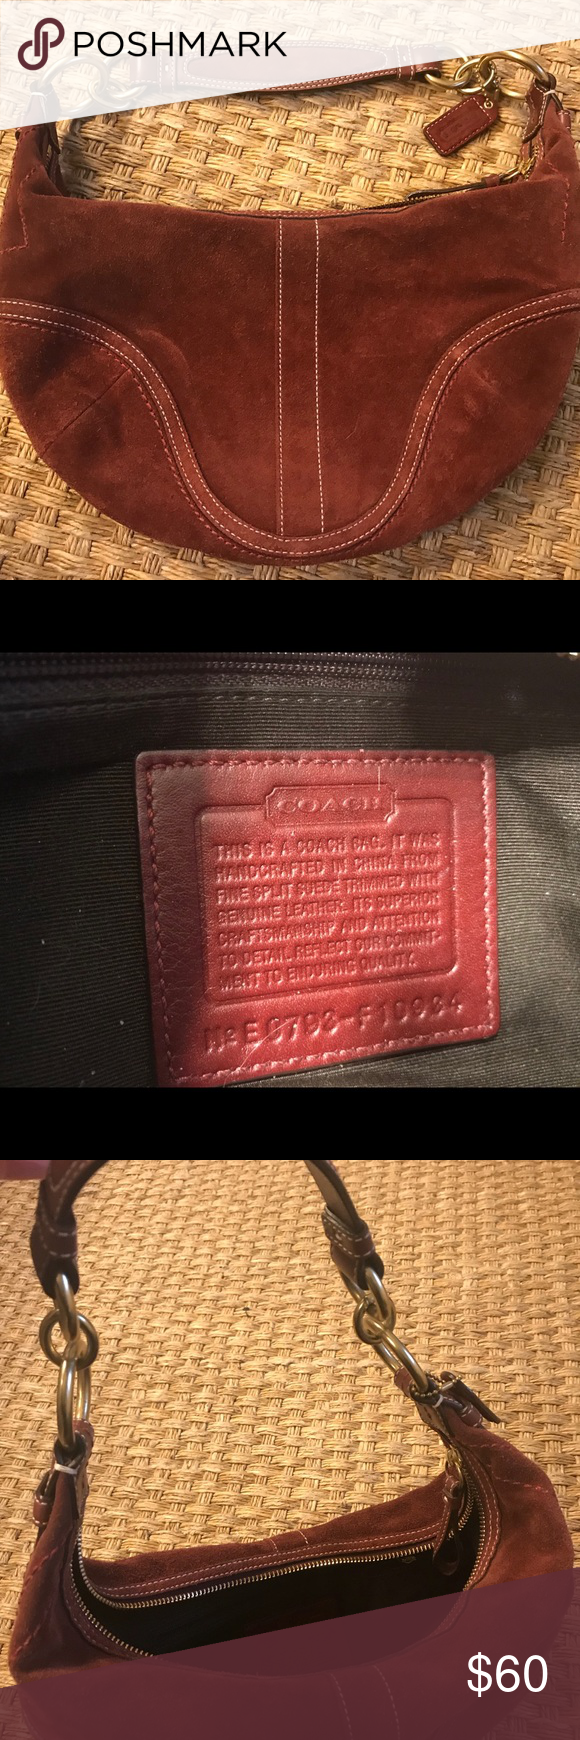 Coach burgundy wine suede hobo bag Zip closure. Gold hardware. Very good  condition. Coach Bags Hobos f18b7e6e38